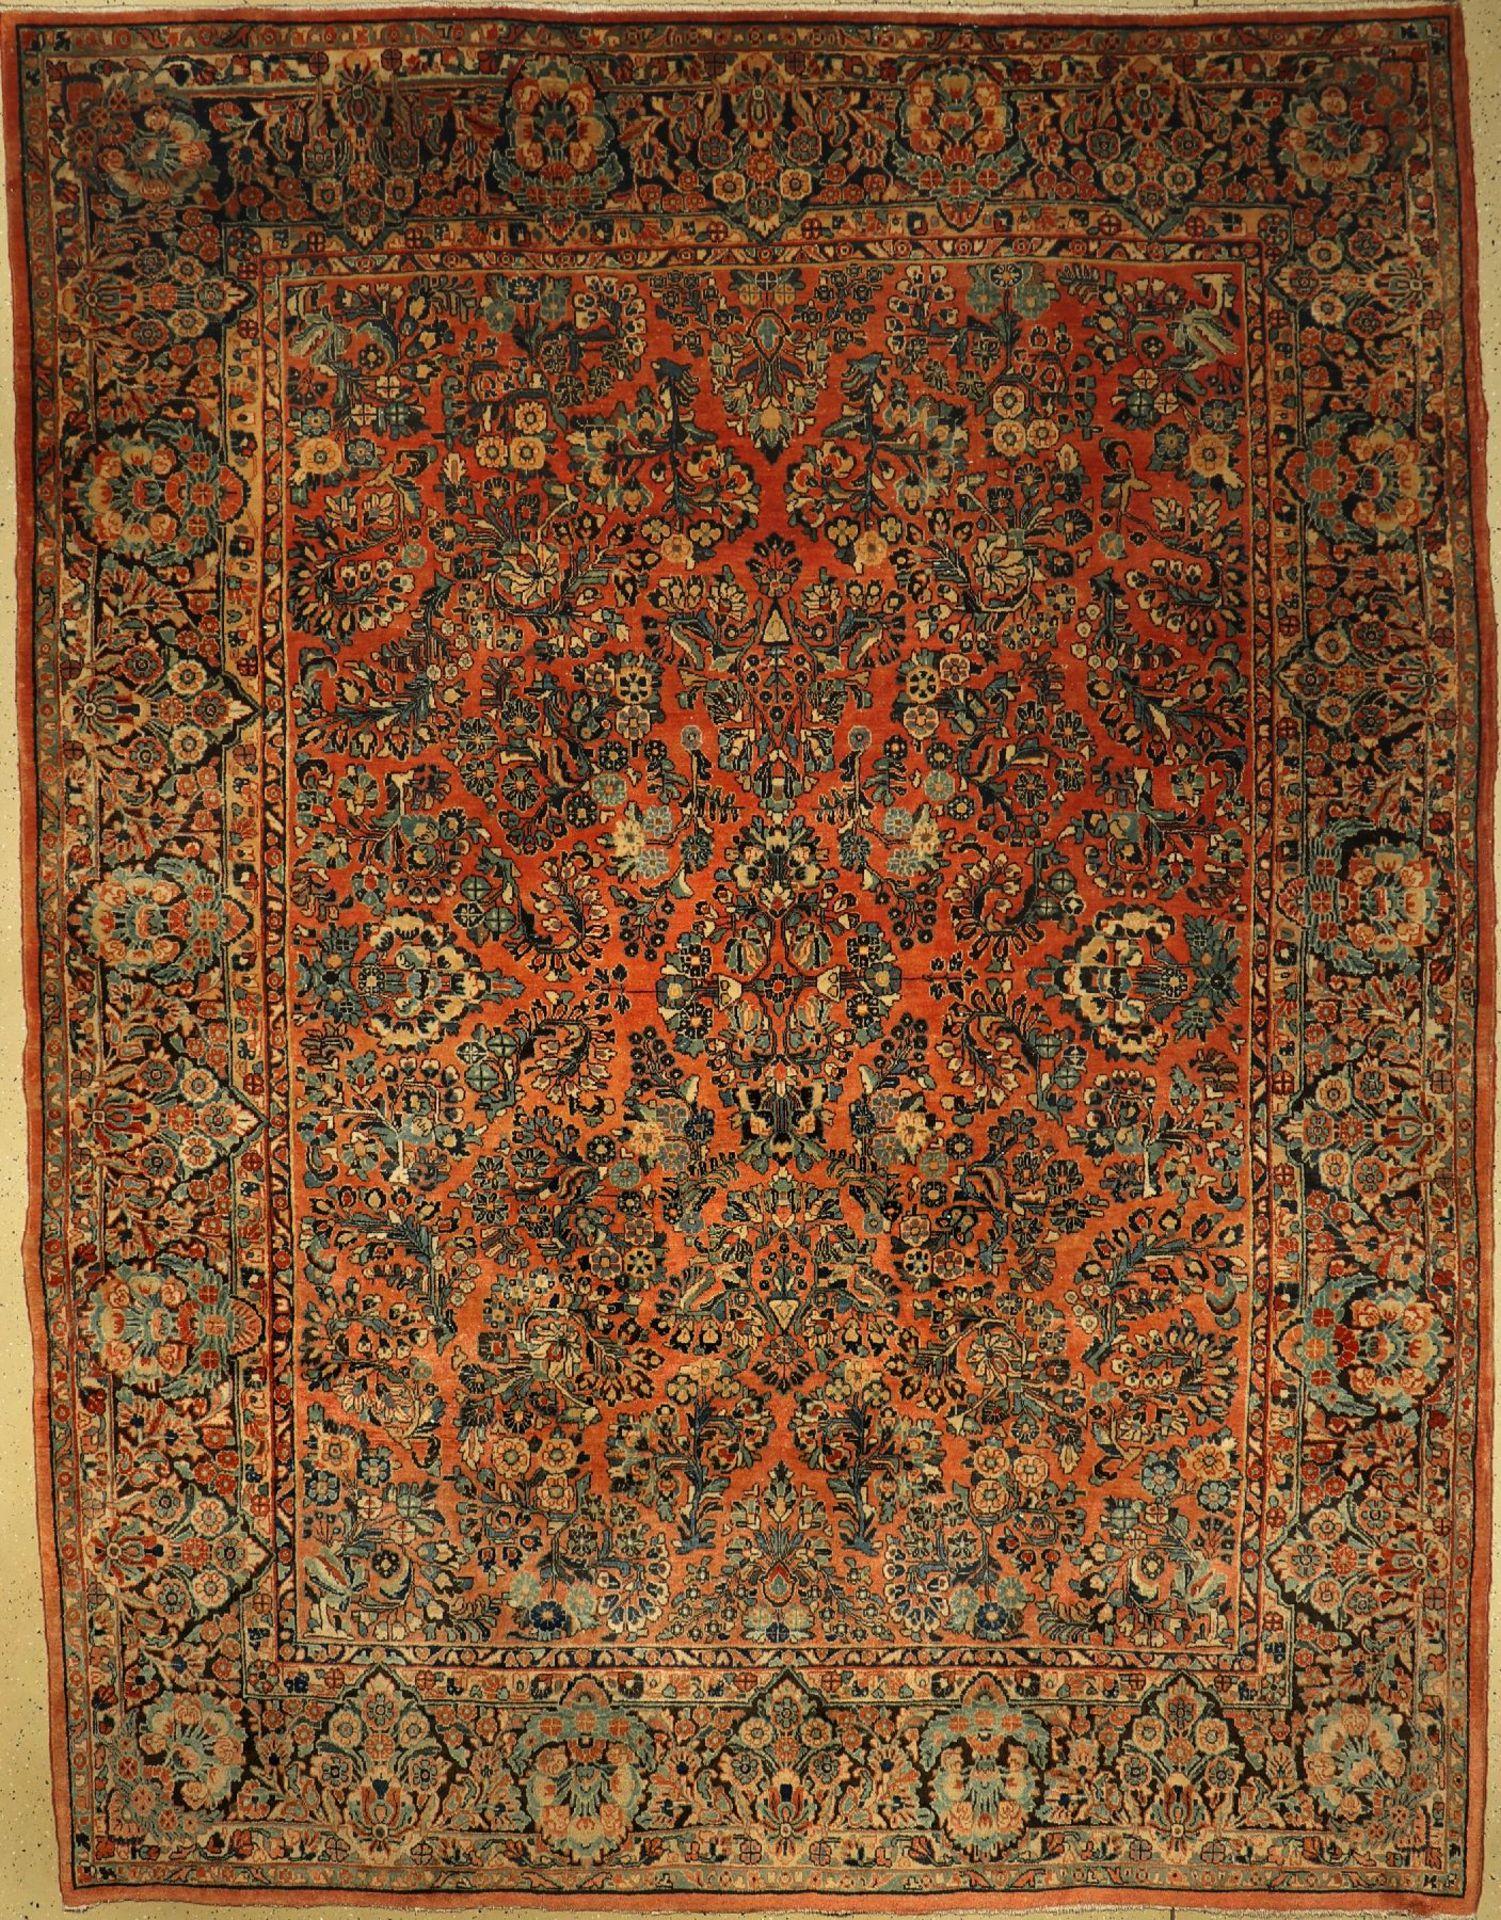 Sarogh (Us Re-Import) alt, Persien, um 1930, Korkwolle, ca. 353 x 273 cm, EHZ: 3